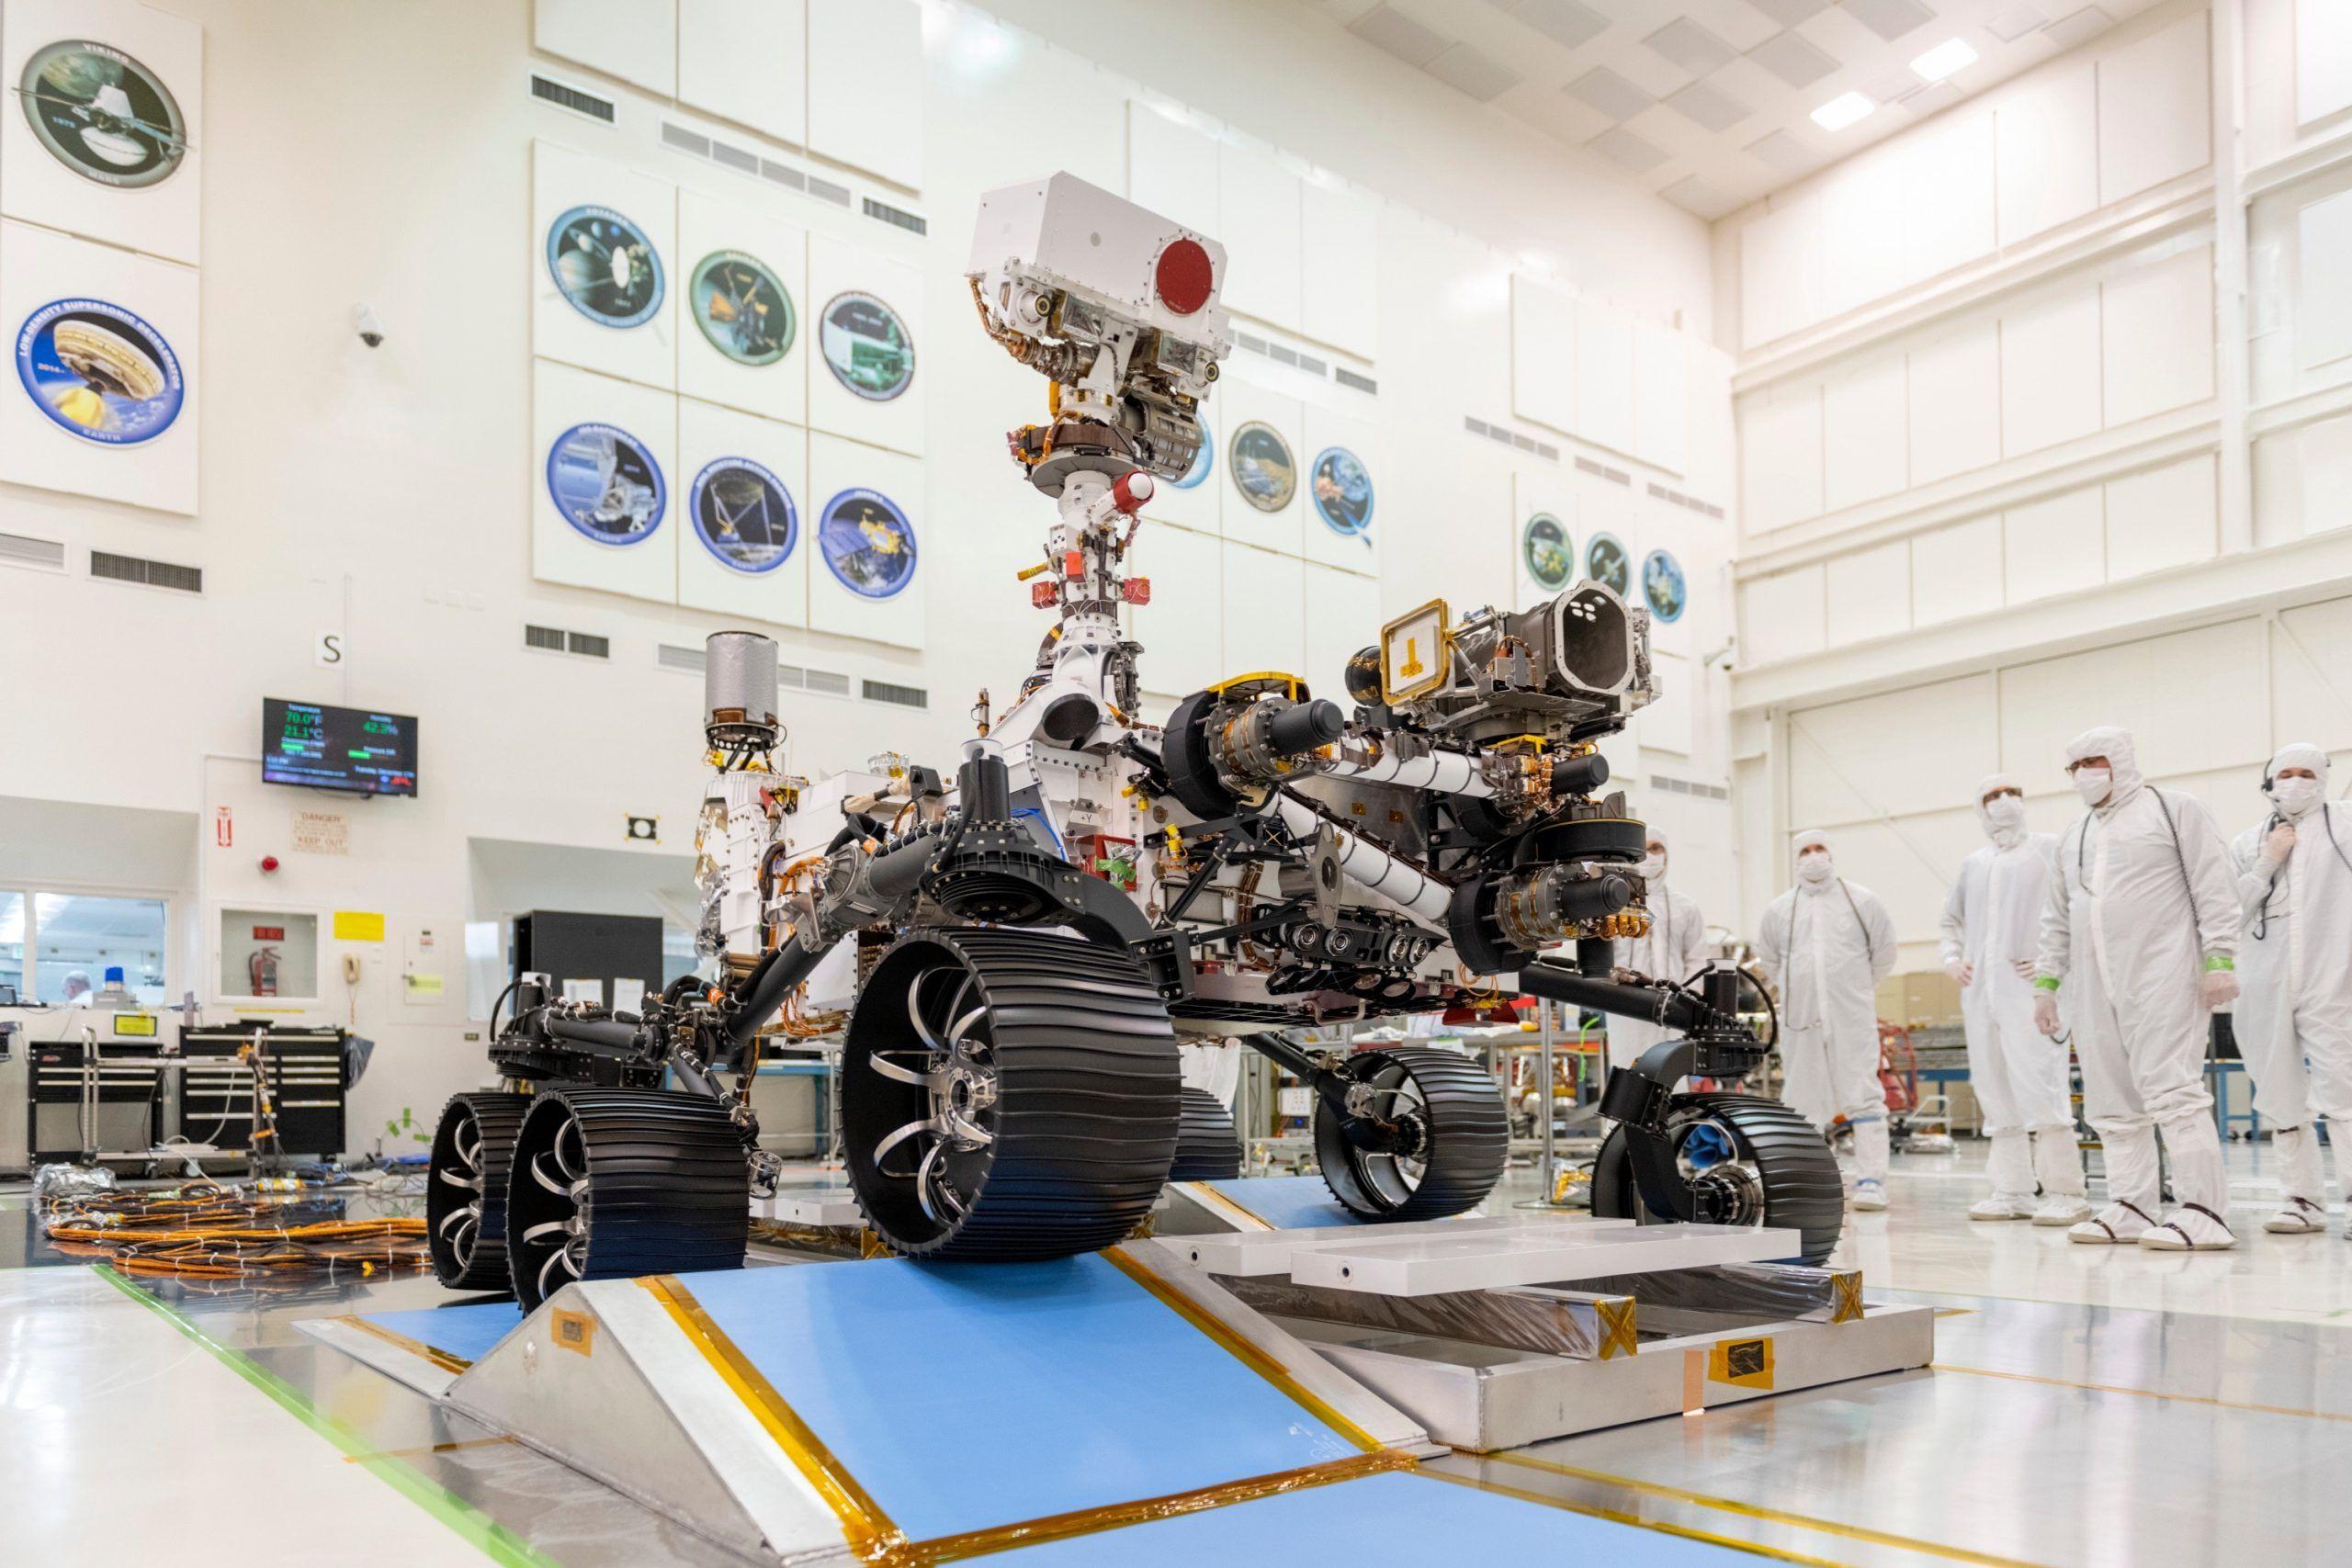 2.5 billion dollar rover